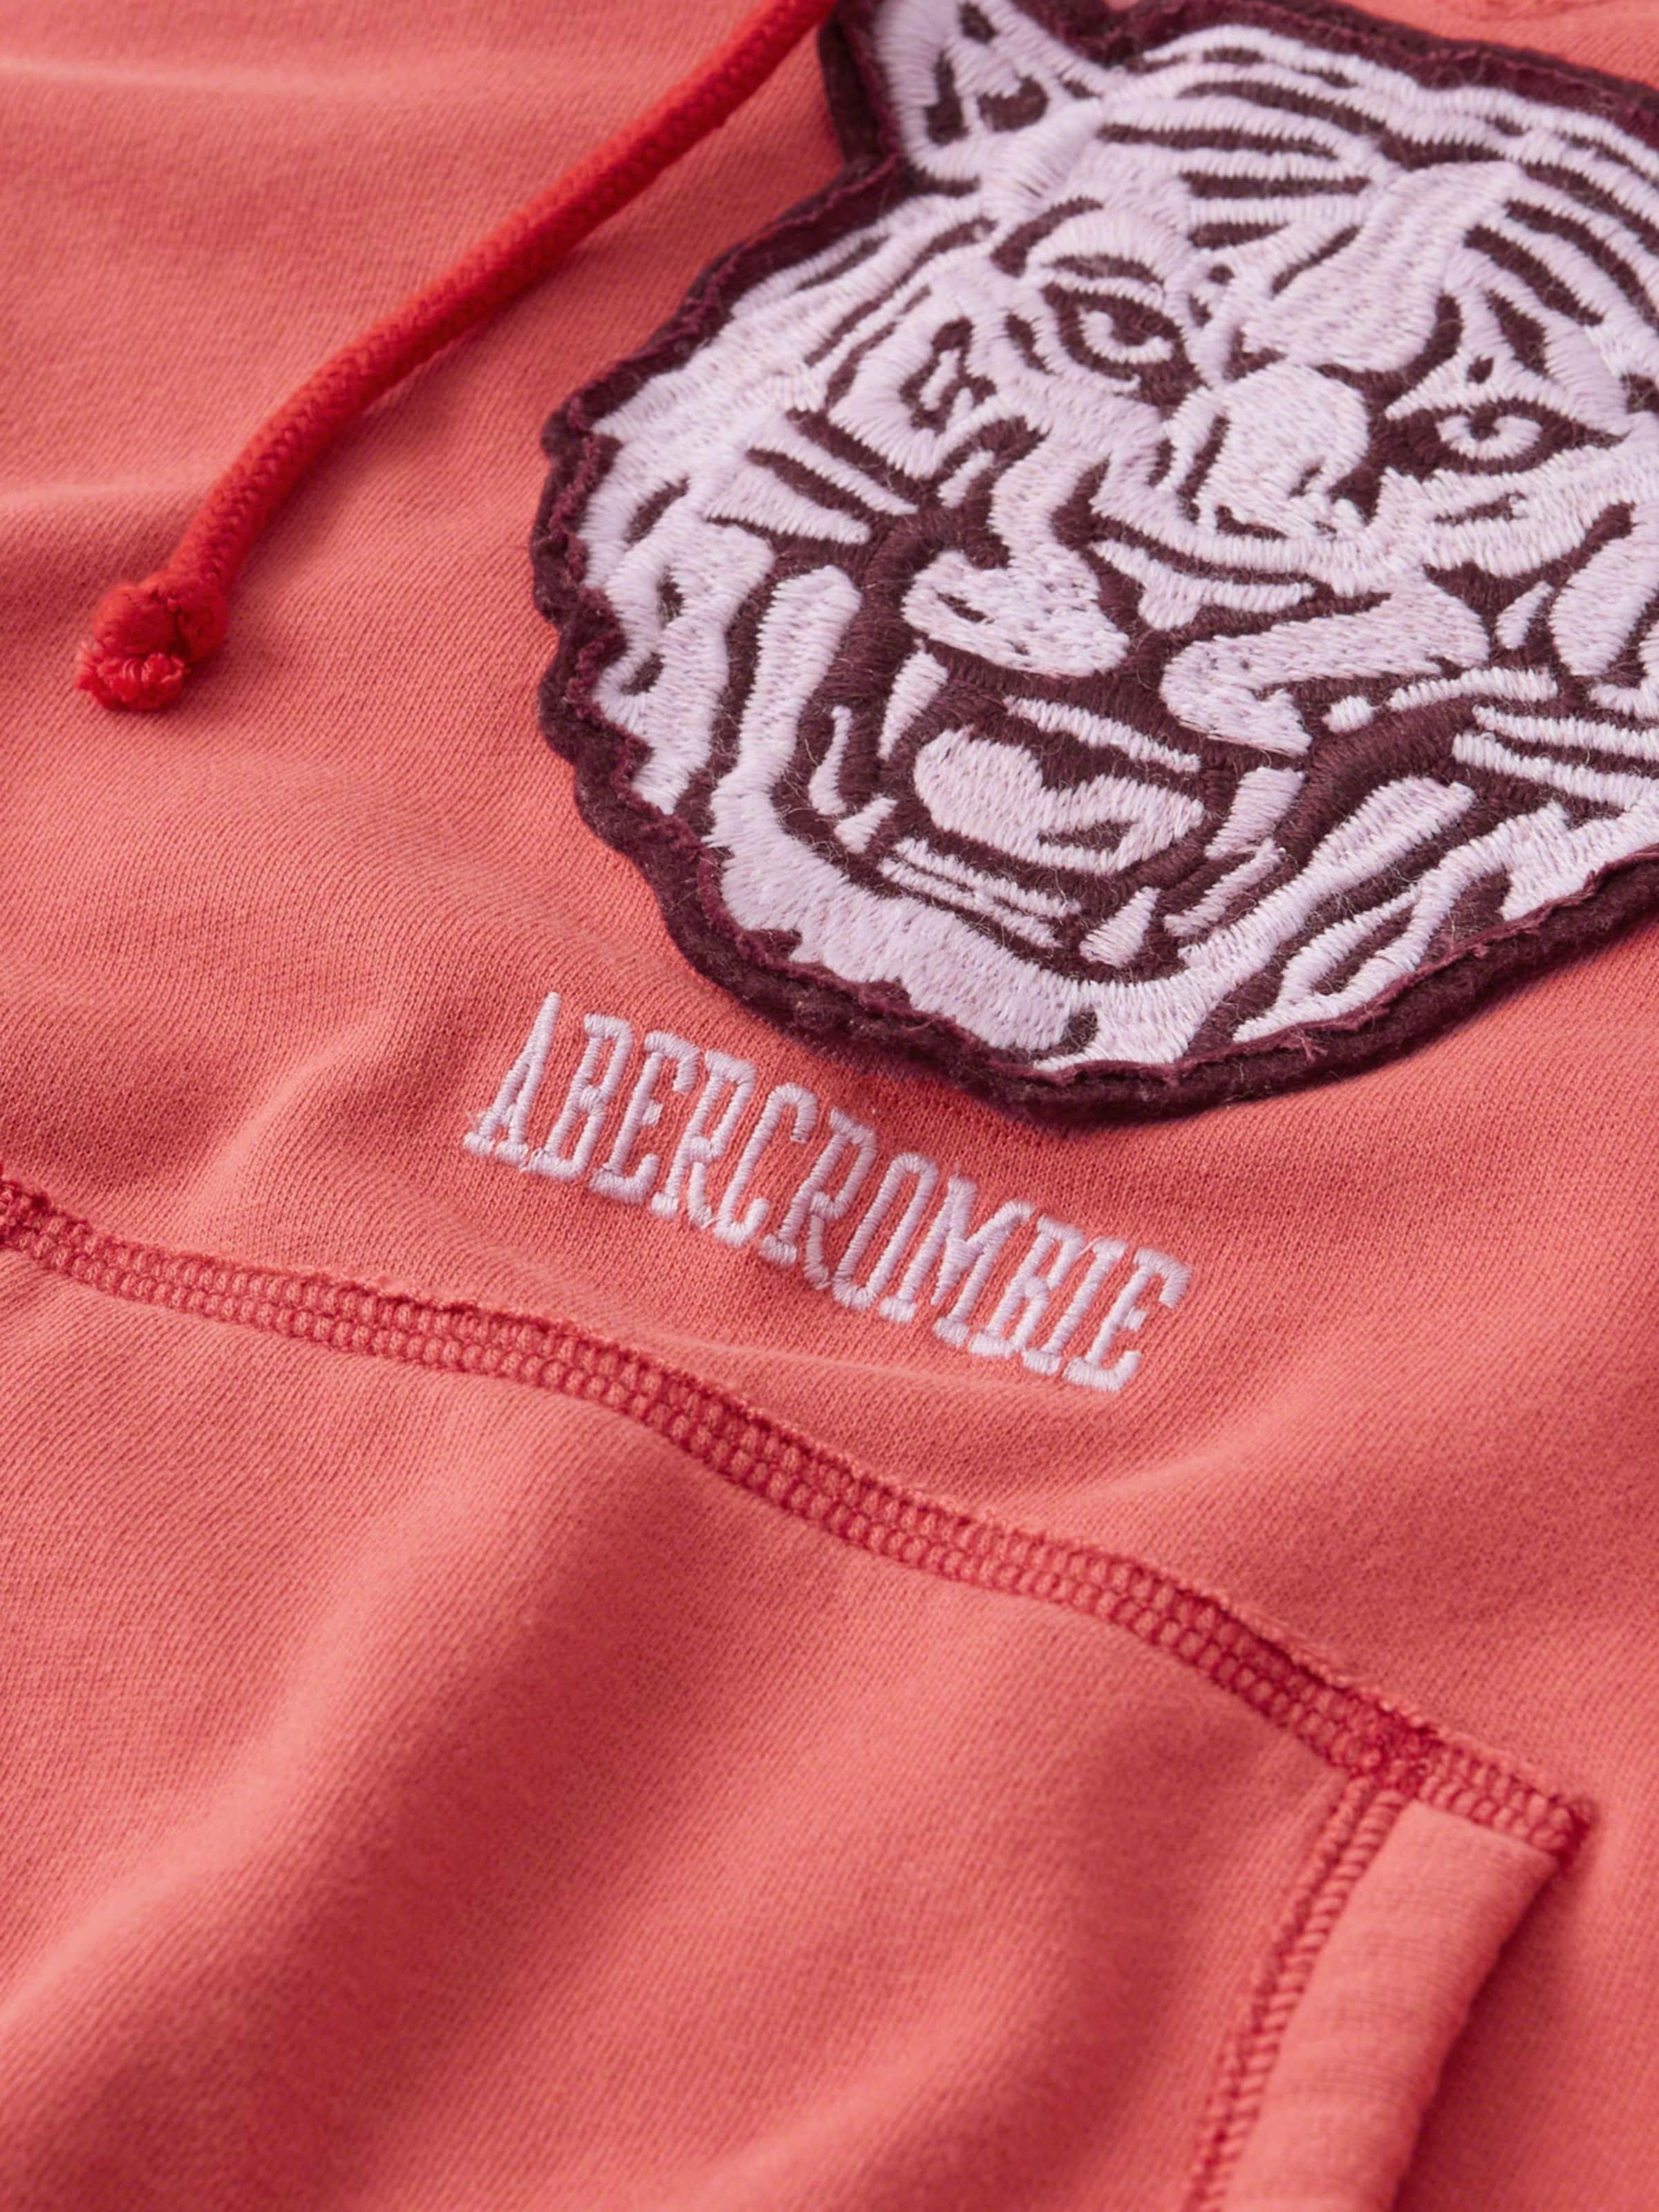 Sweat elevated Fitch Rouge En Mascot Abercrombieamp; Nonlogo 2cc' shirt 'xm18 Po HIbWE2eD9Y